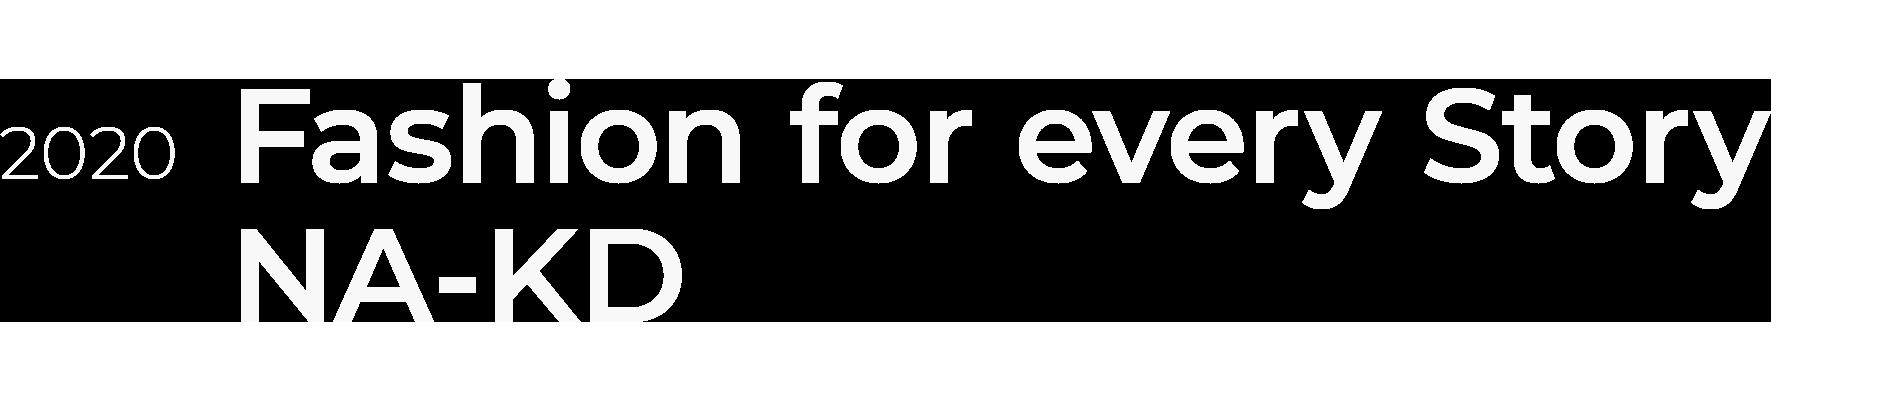 Fashion For Every Story - NA-KD